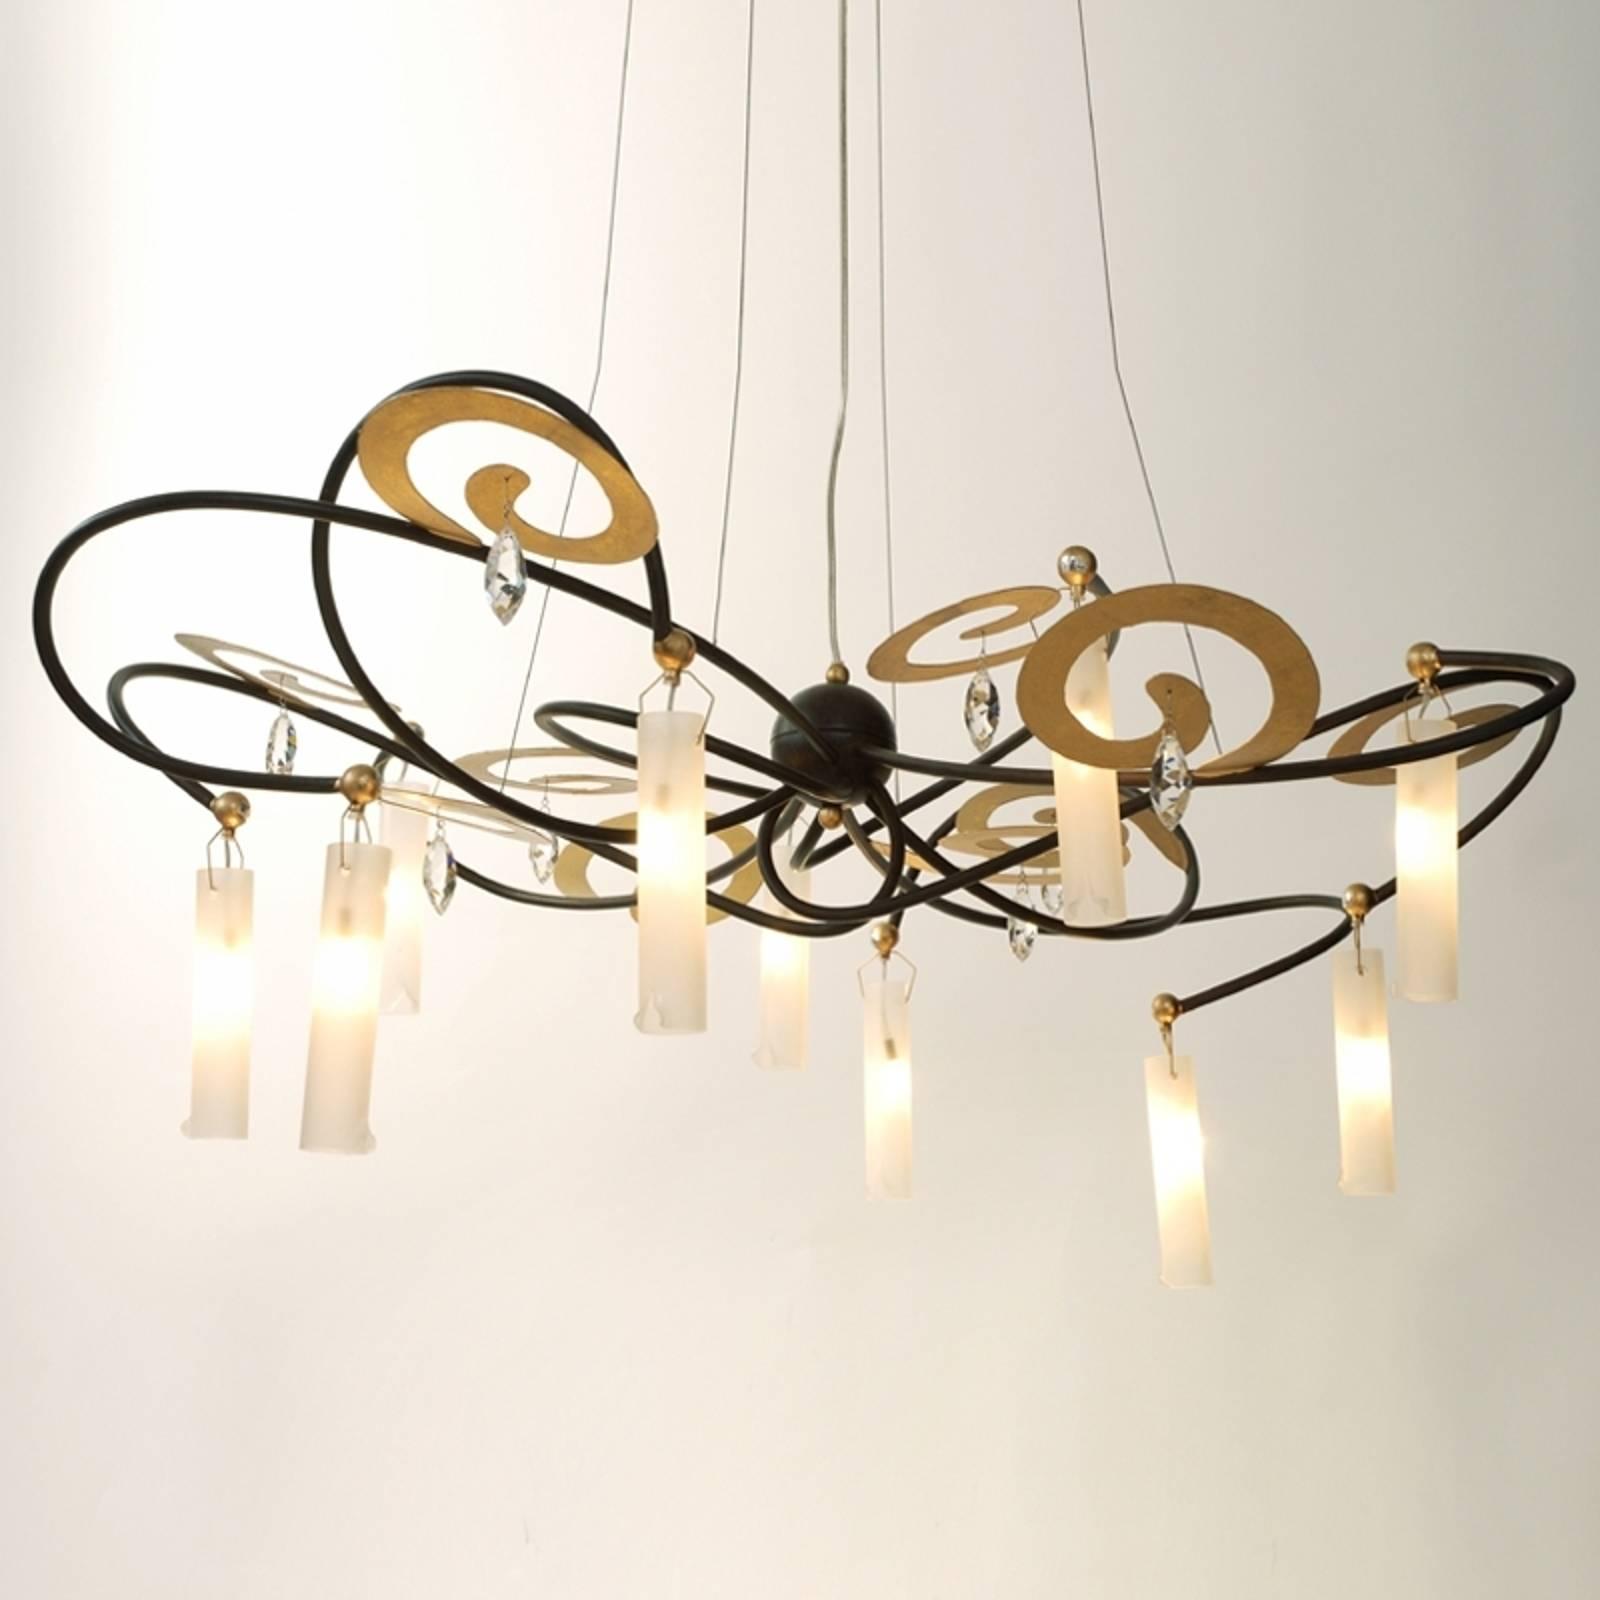 Exclusieve LED hanglamp Casino Grande, 110 cm